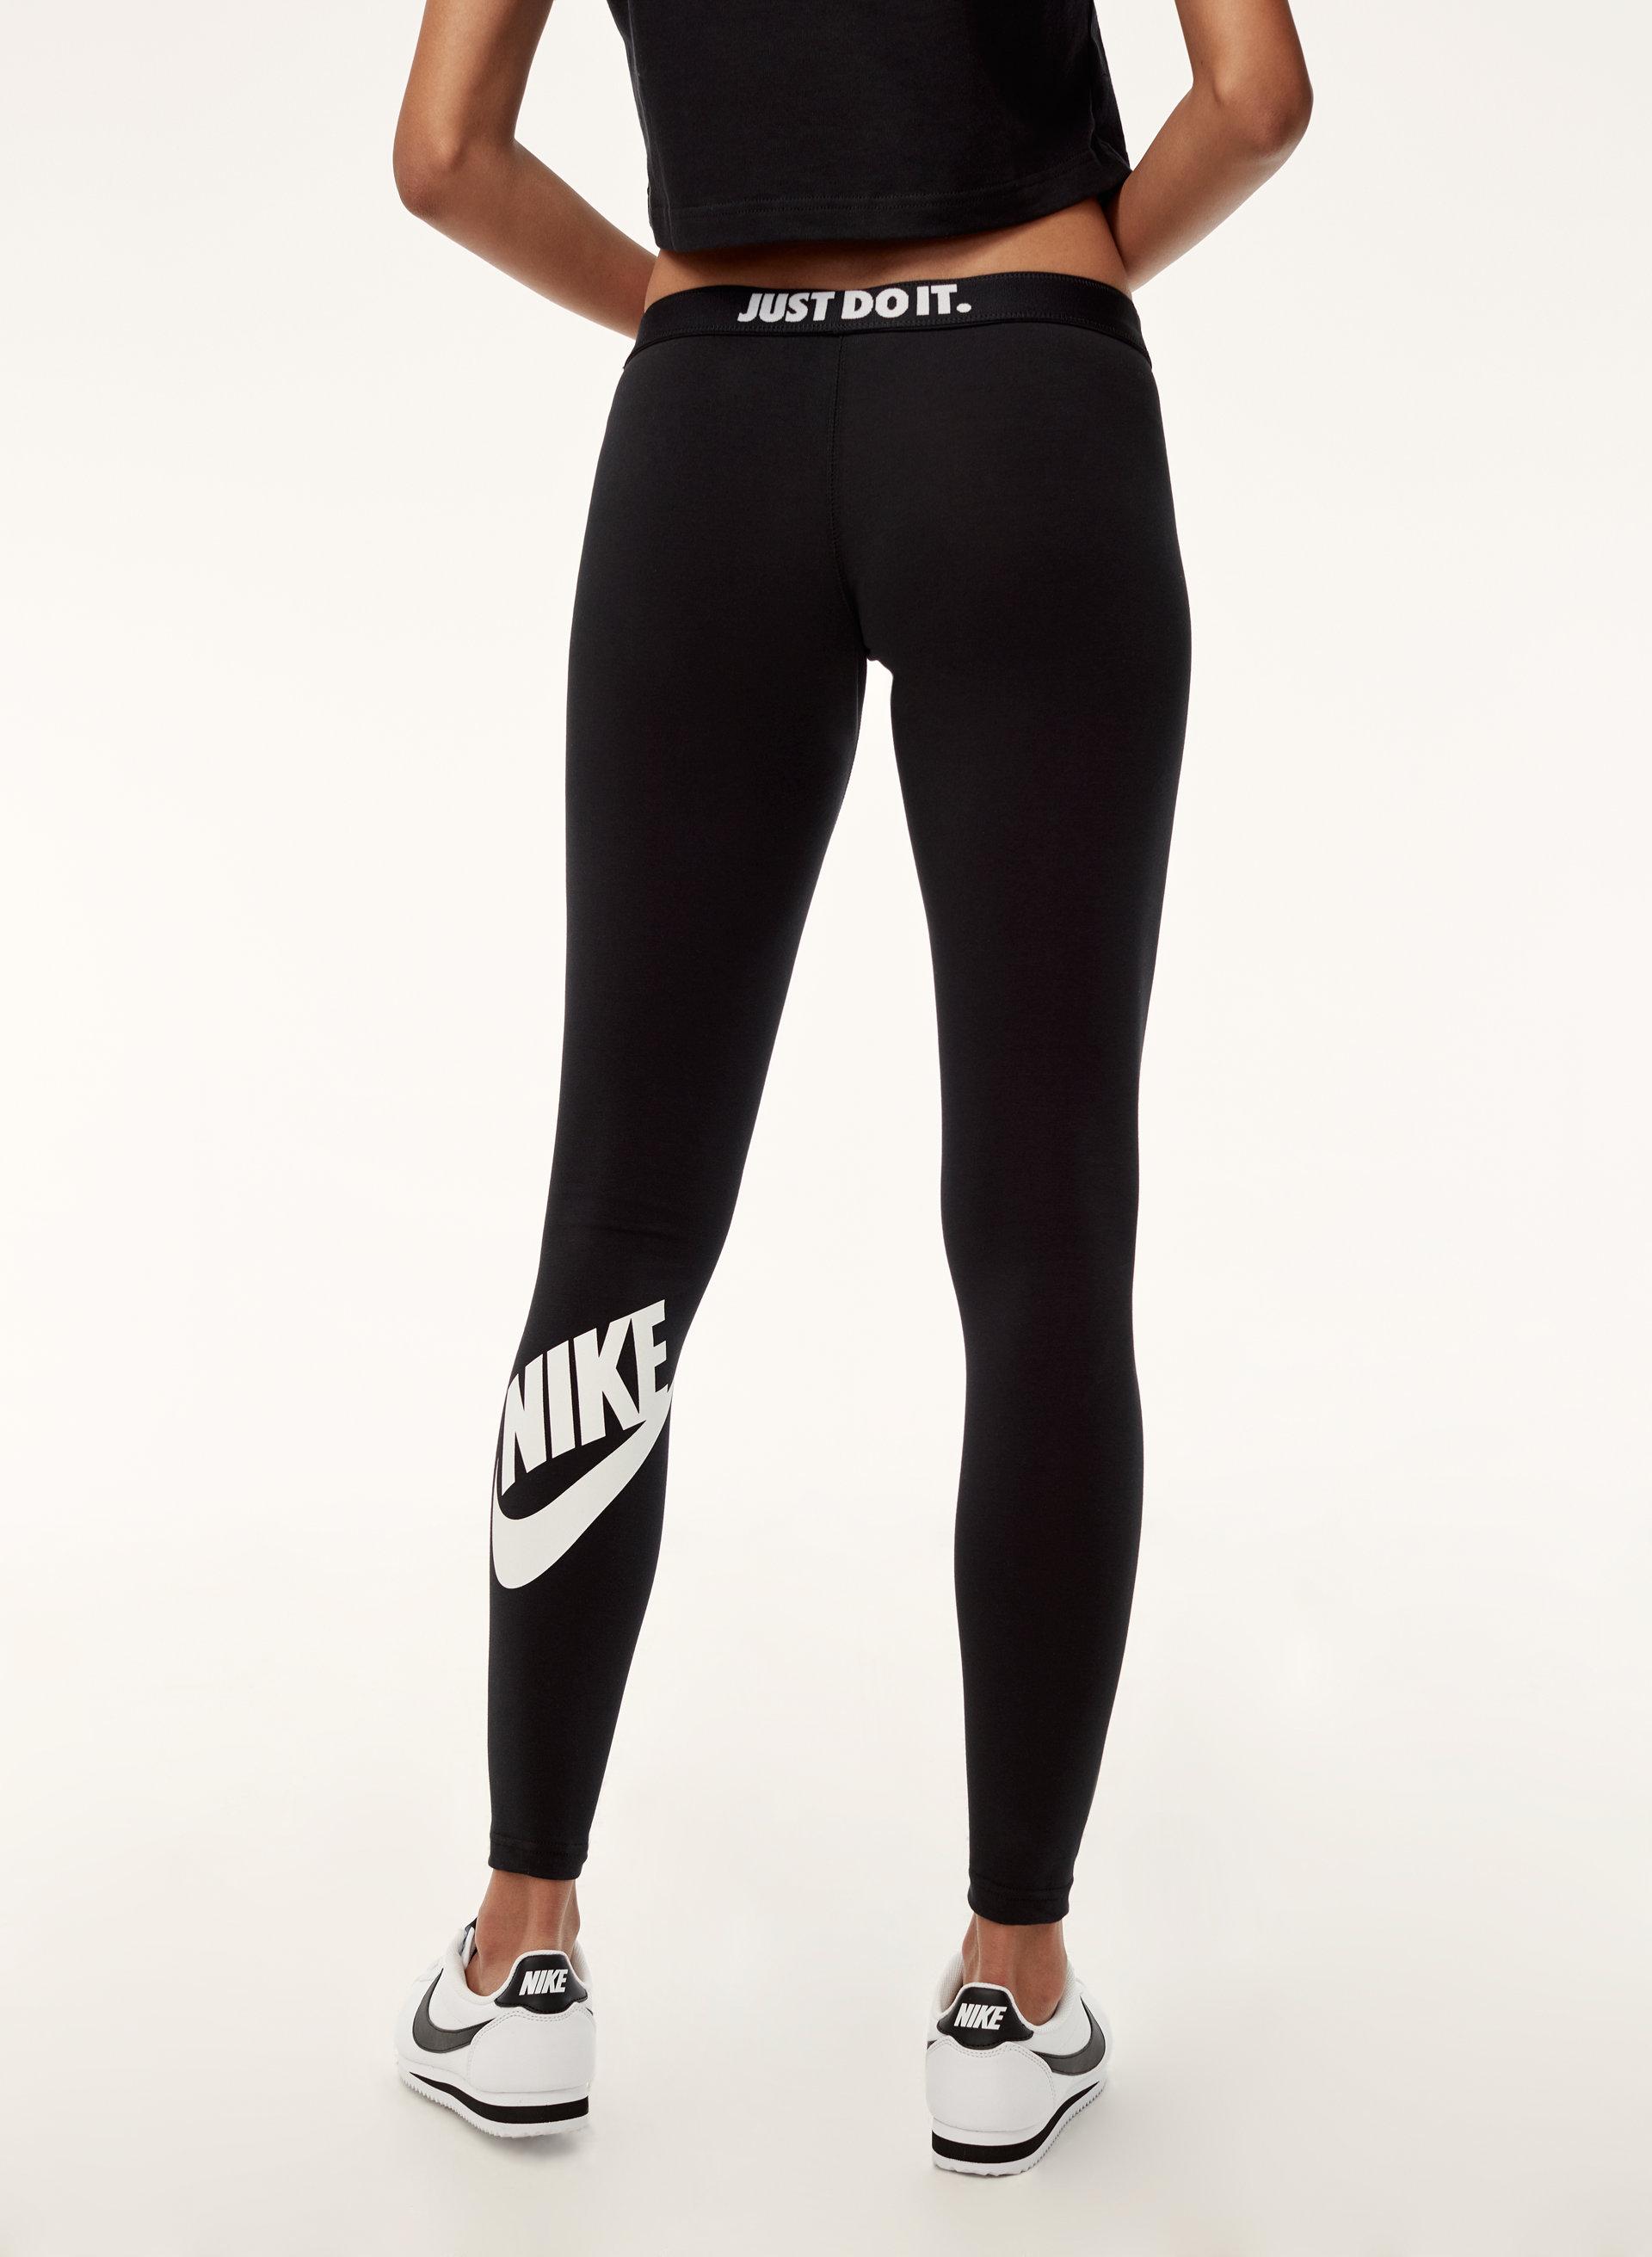 bcb72c5d8f053 Nike LEGASEE LEGGING | Aritzia US